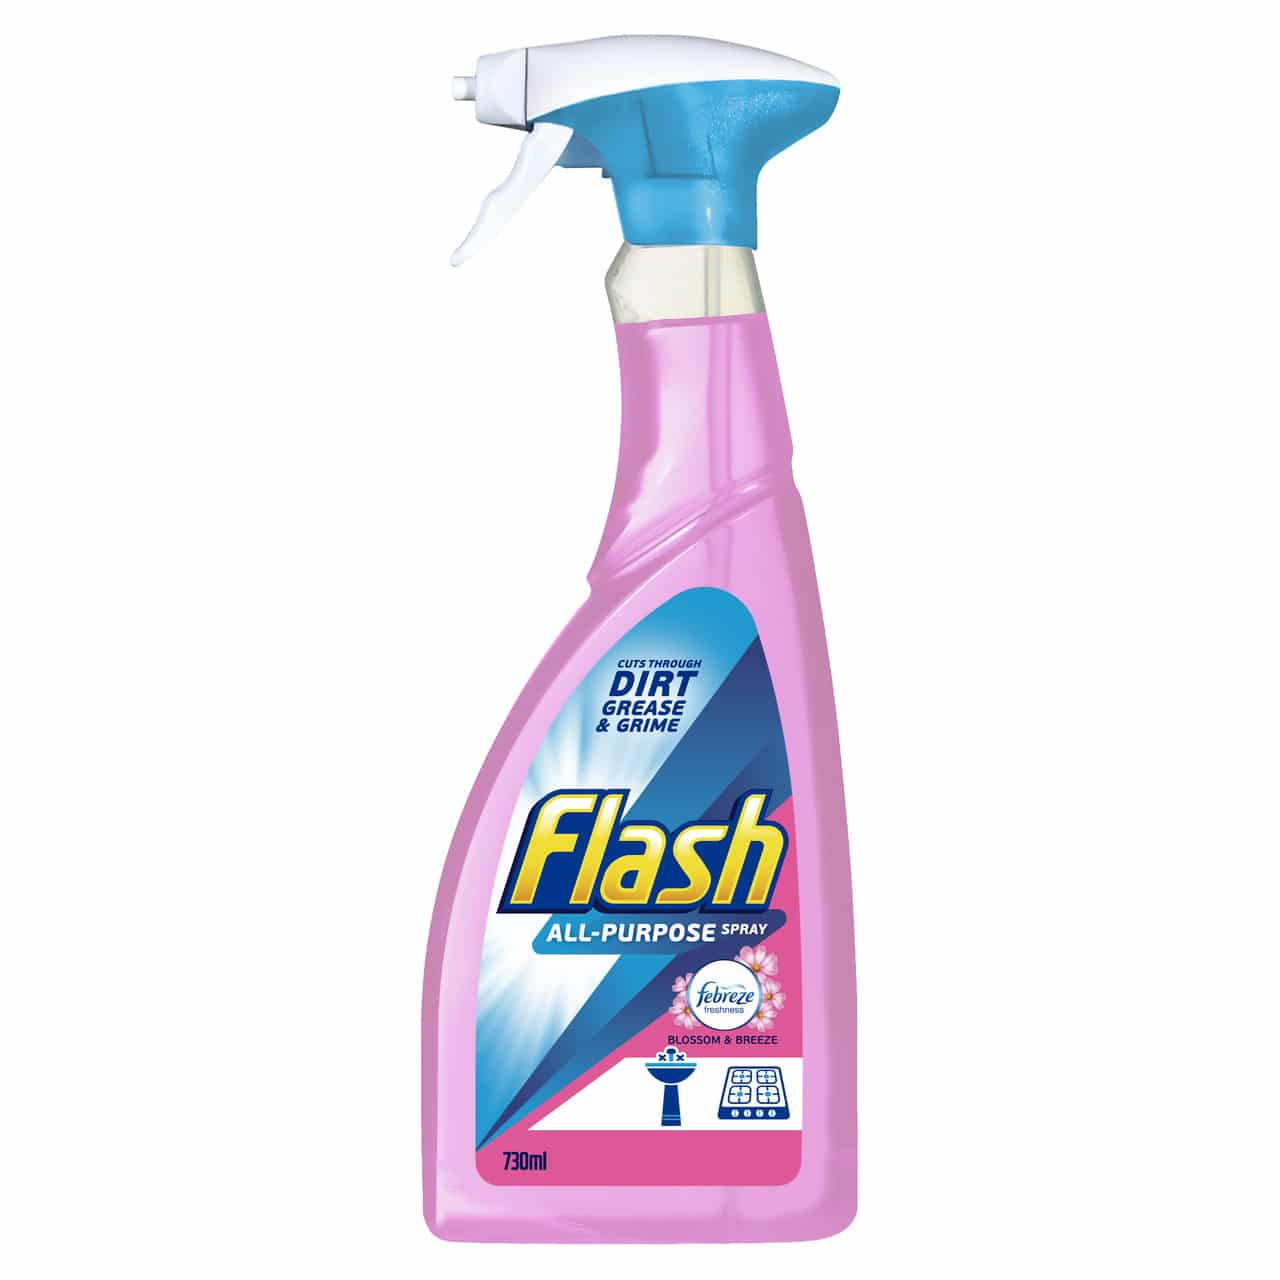 FLASH ALL PURPOSE SPRAY BLOSSOM & BREEZE 730ML